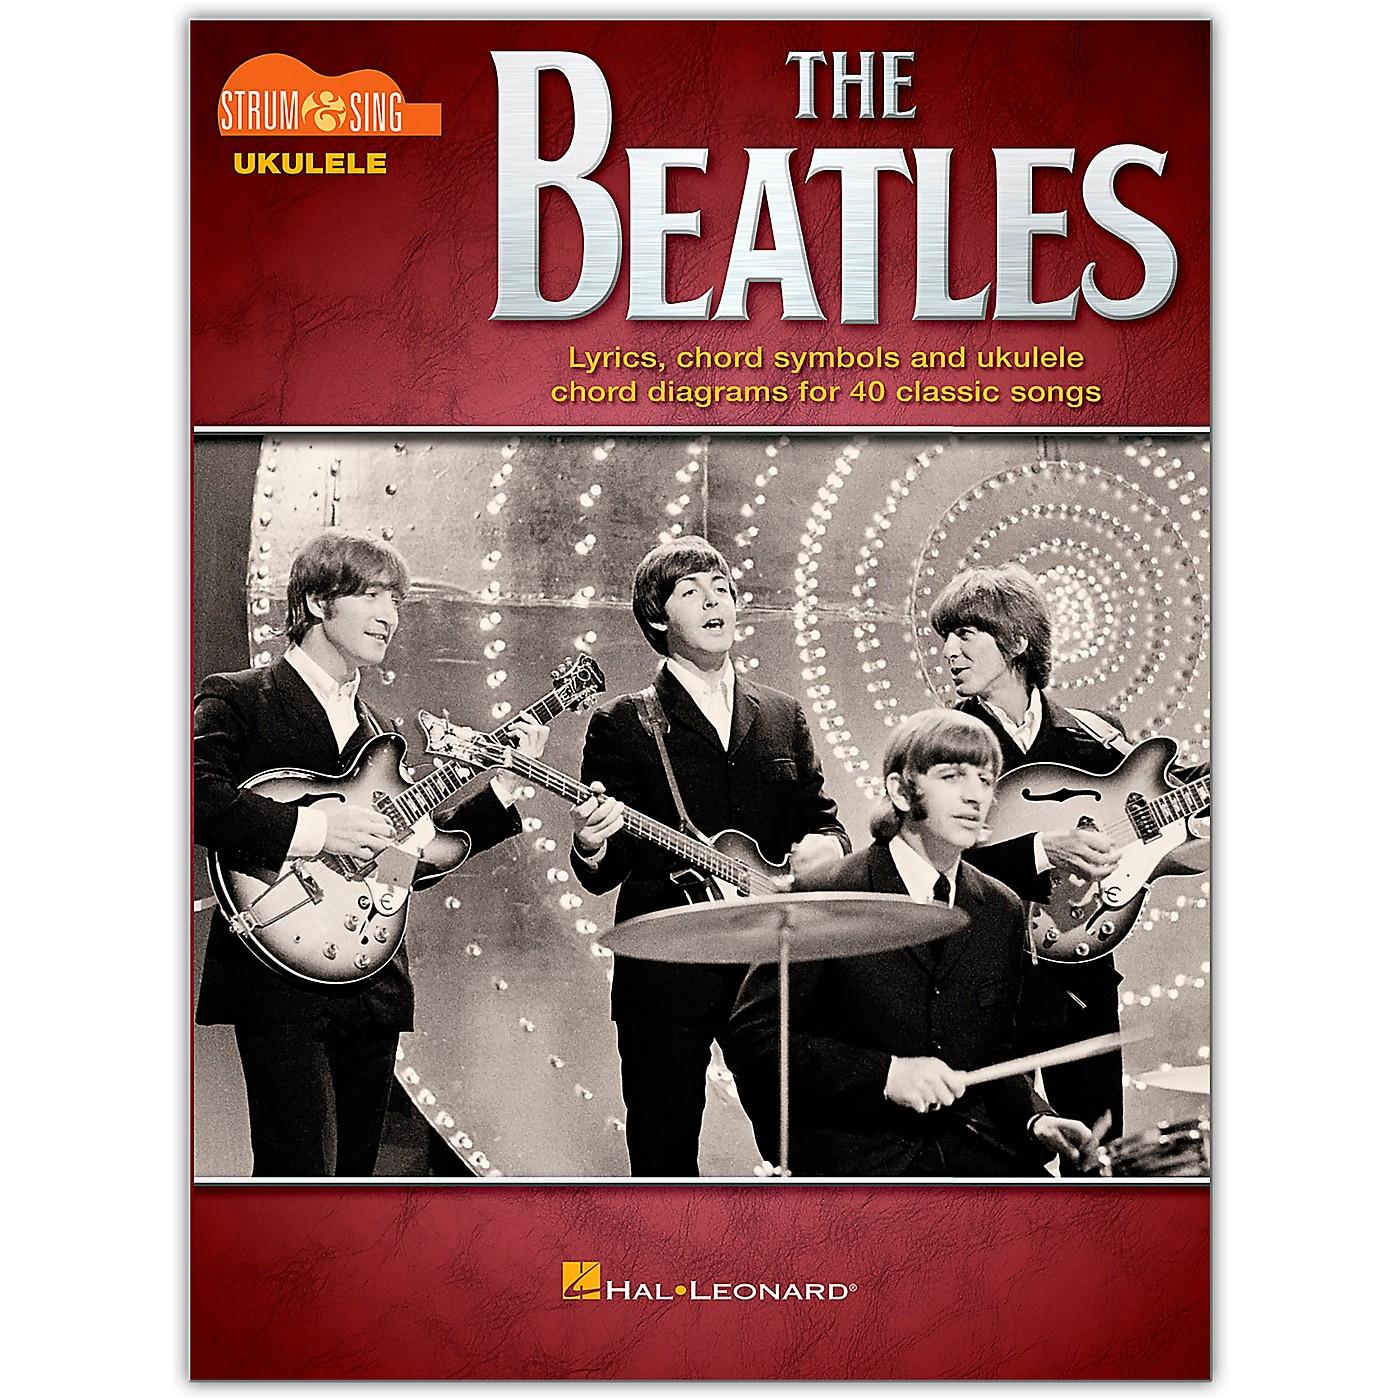 Hal Leonard The Beatles-Strum & Sing Ukulele thumbnail